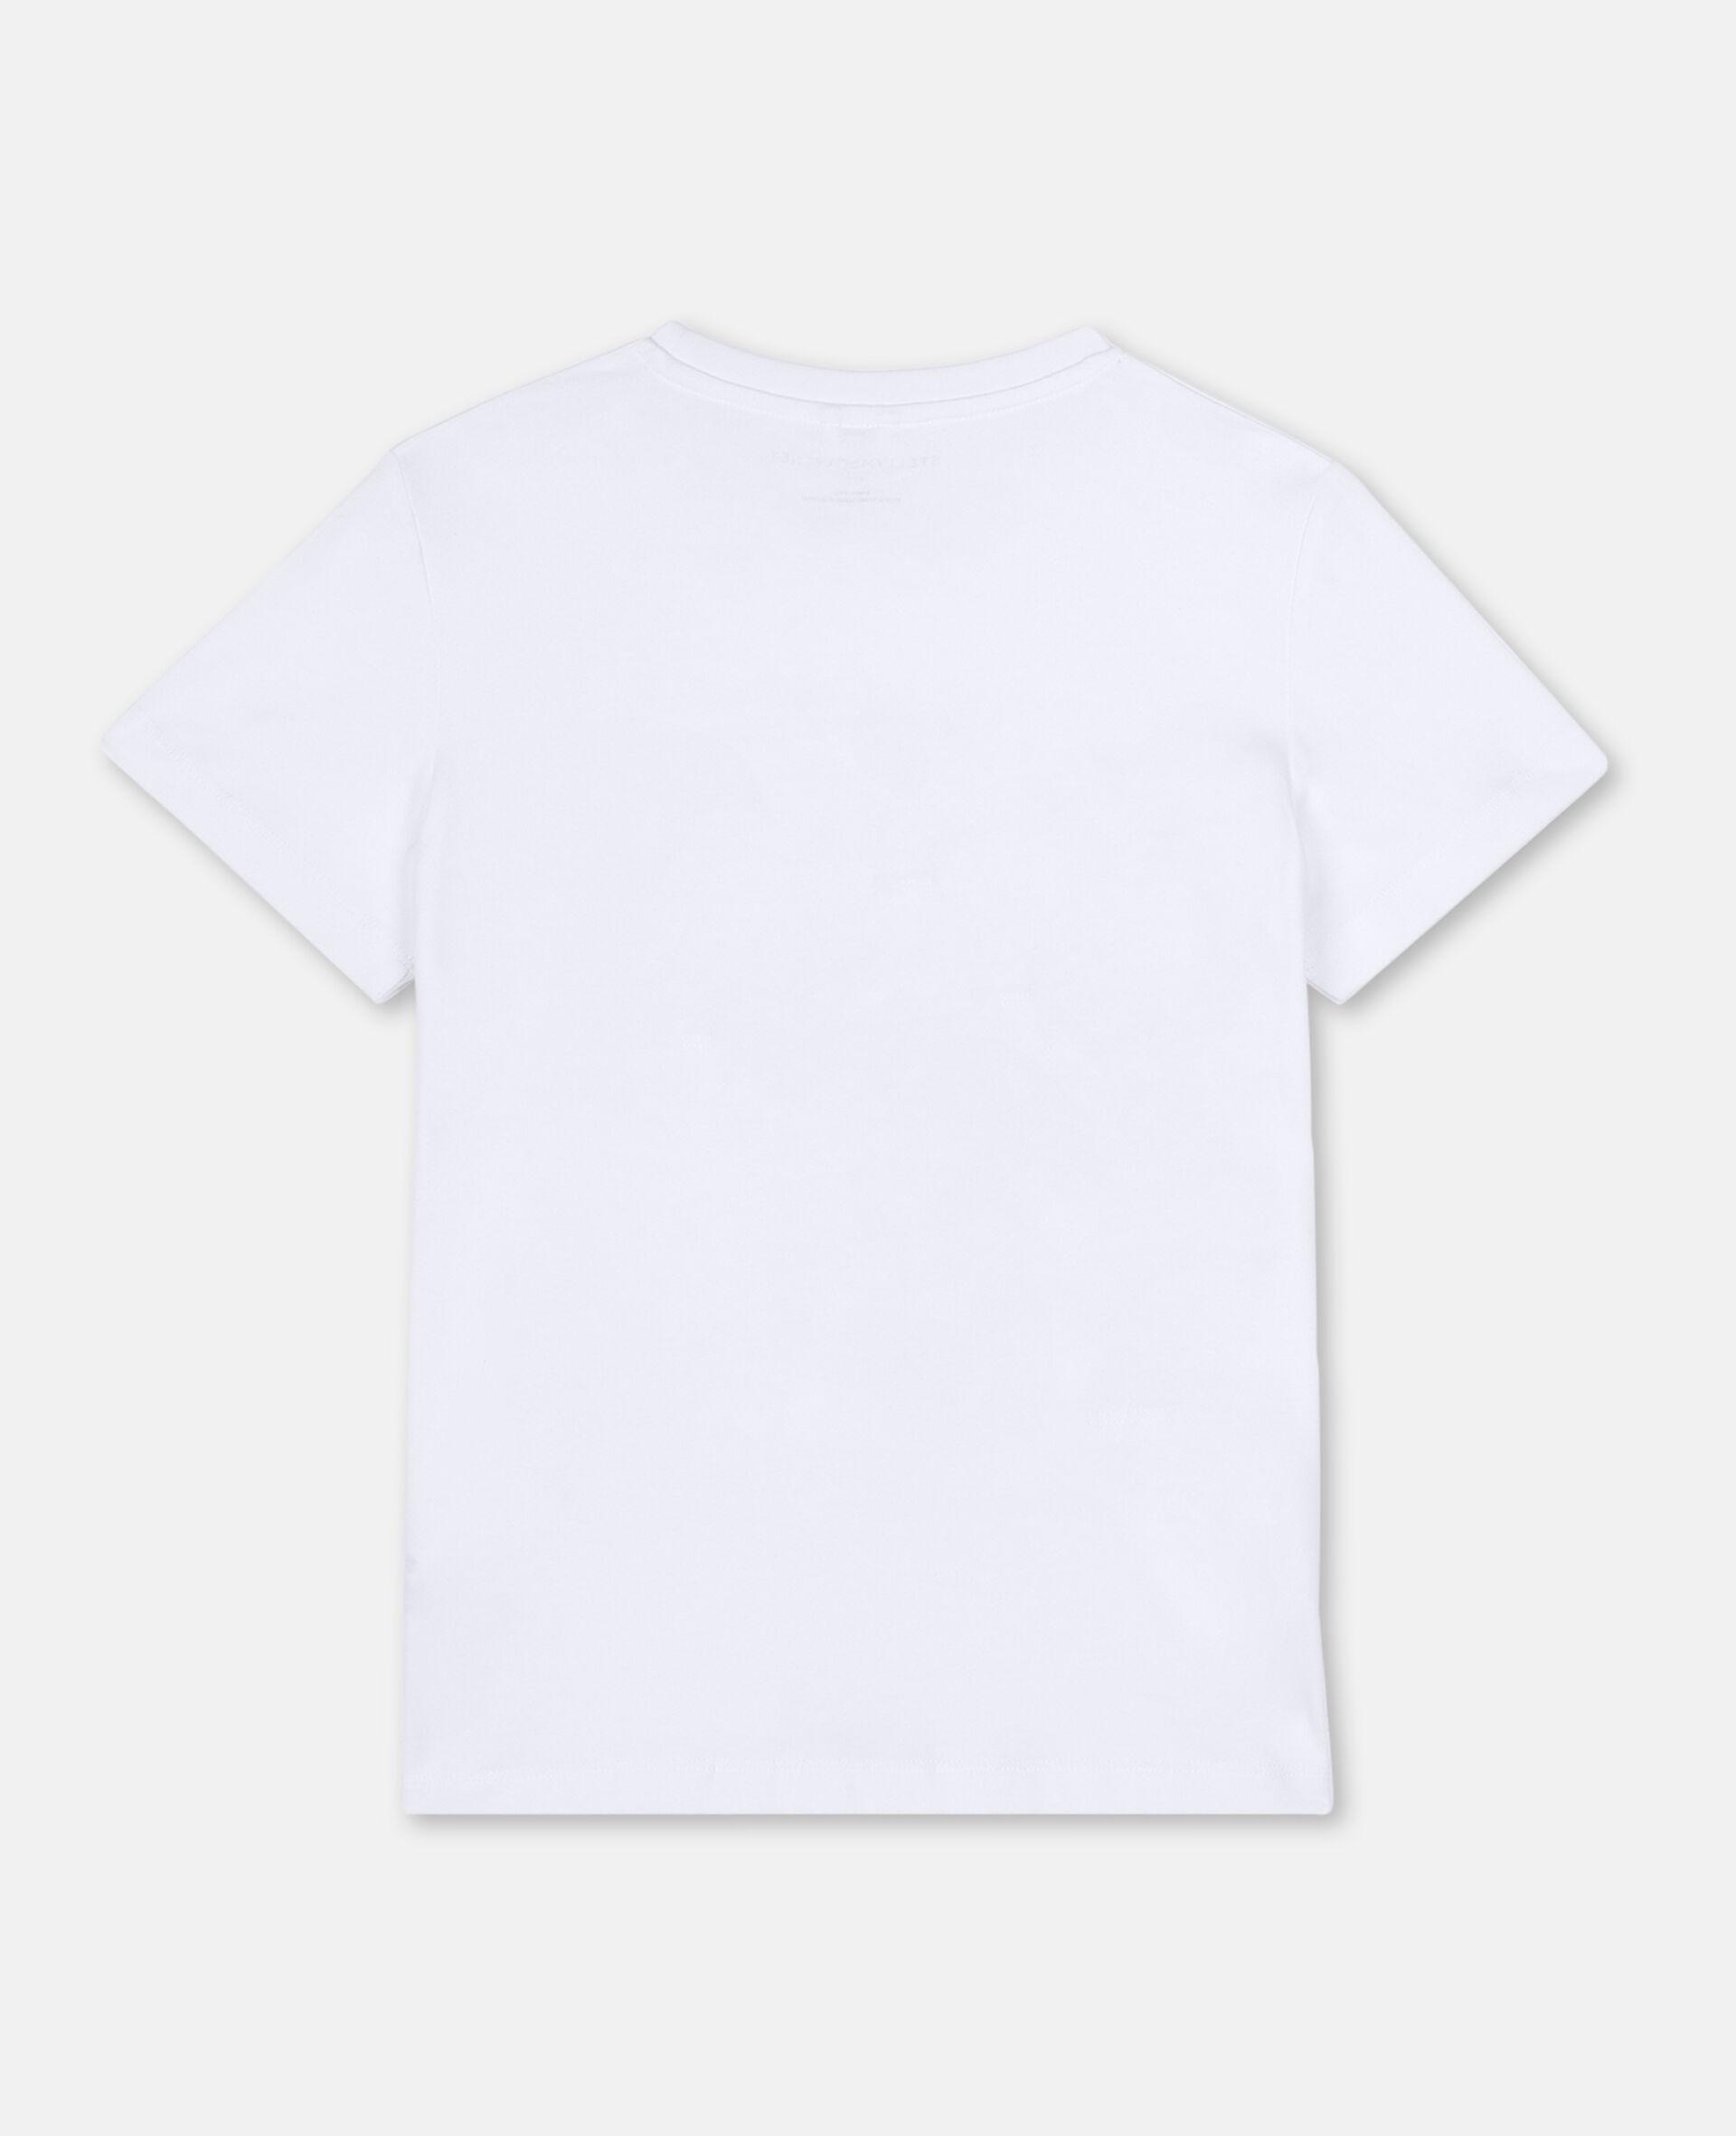 Baumwoll-T-Shirt mit 3D-Fernglas-Print -Weiß-large image number 3